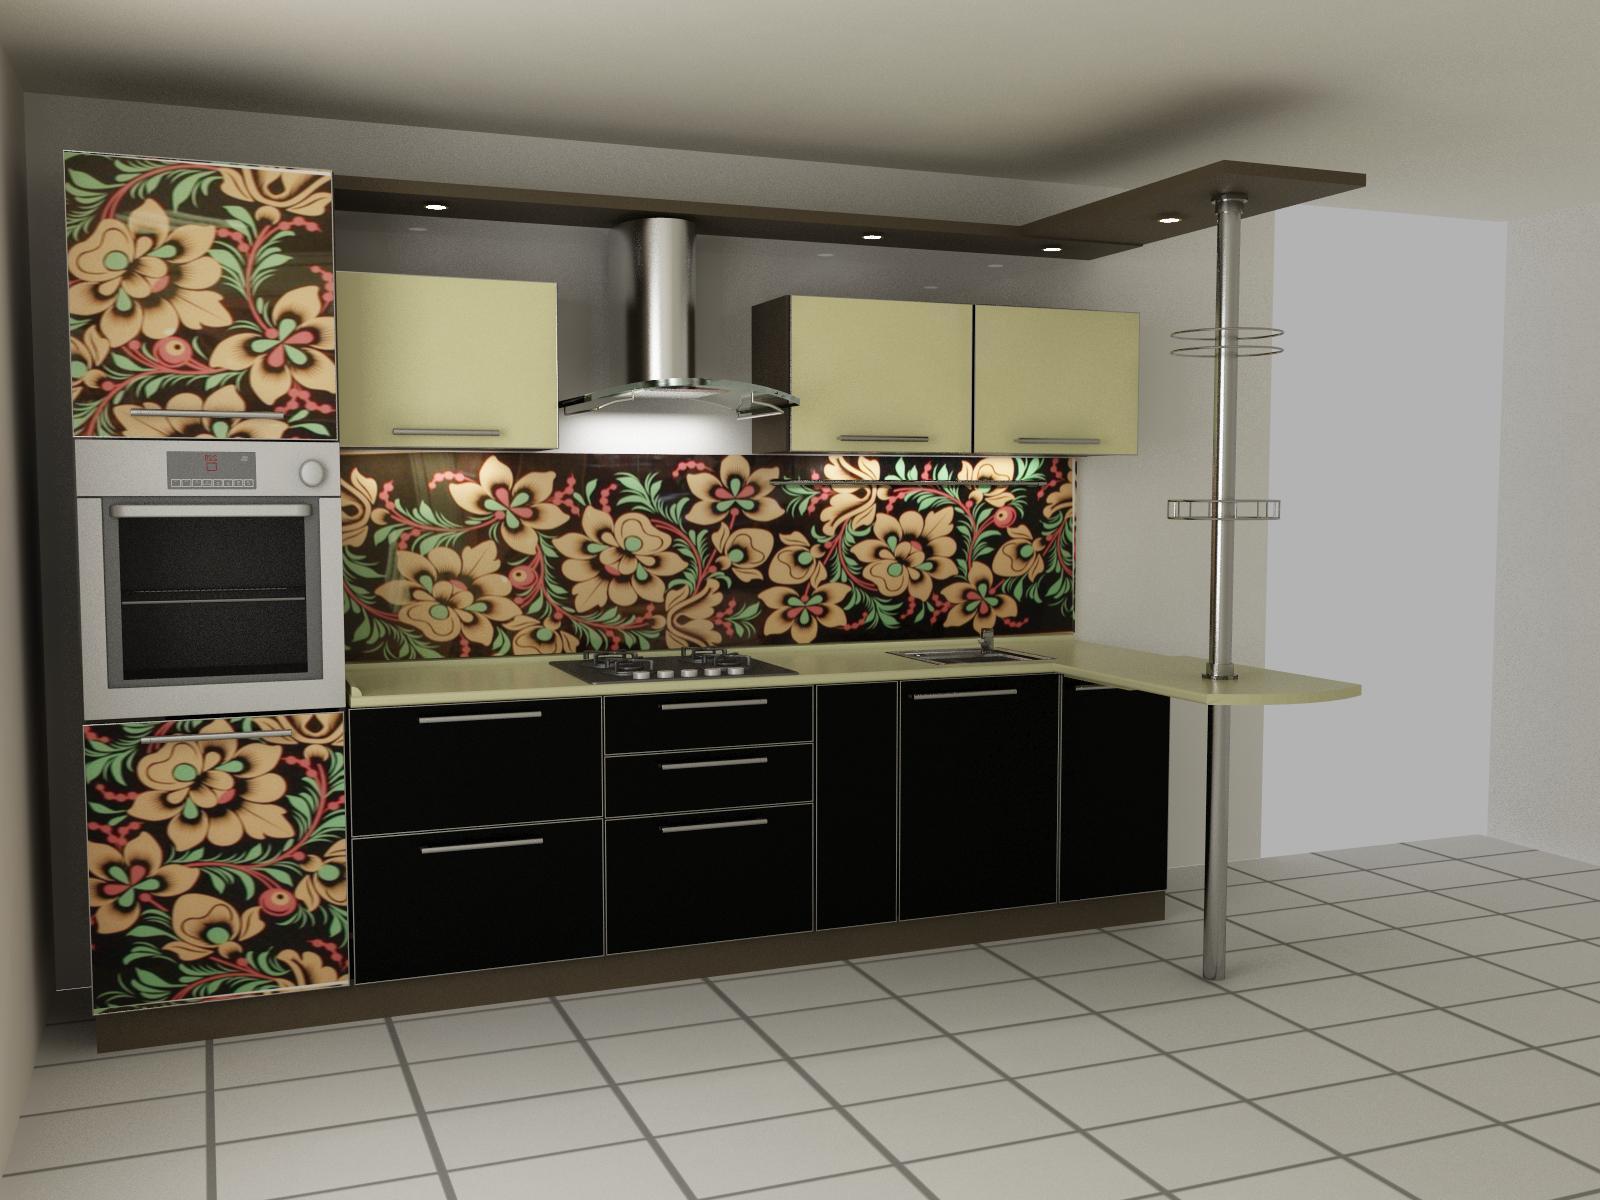 фото кухни МАМА русский стиль.jpg